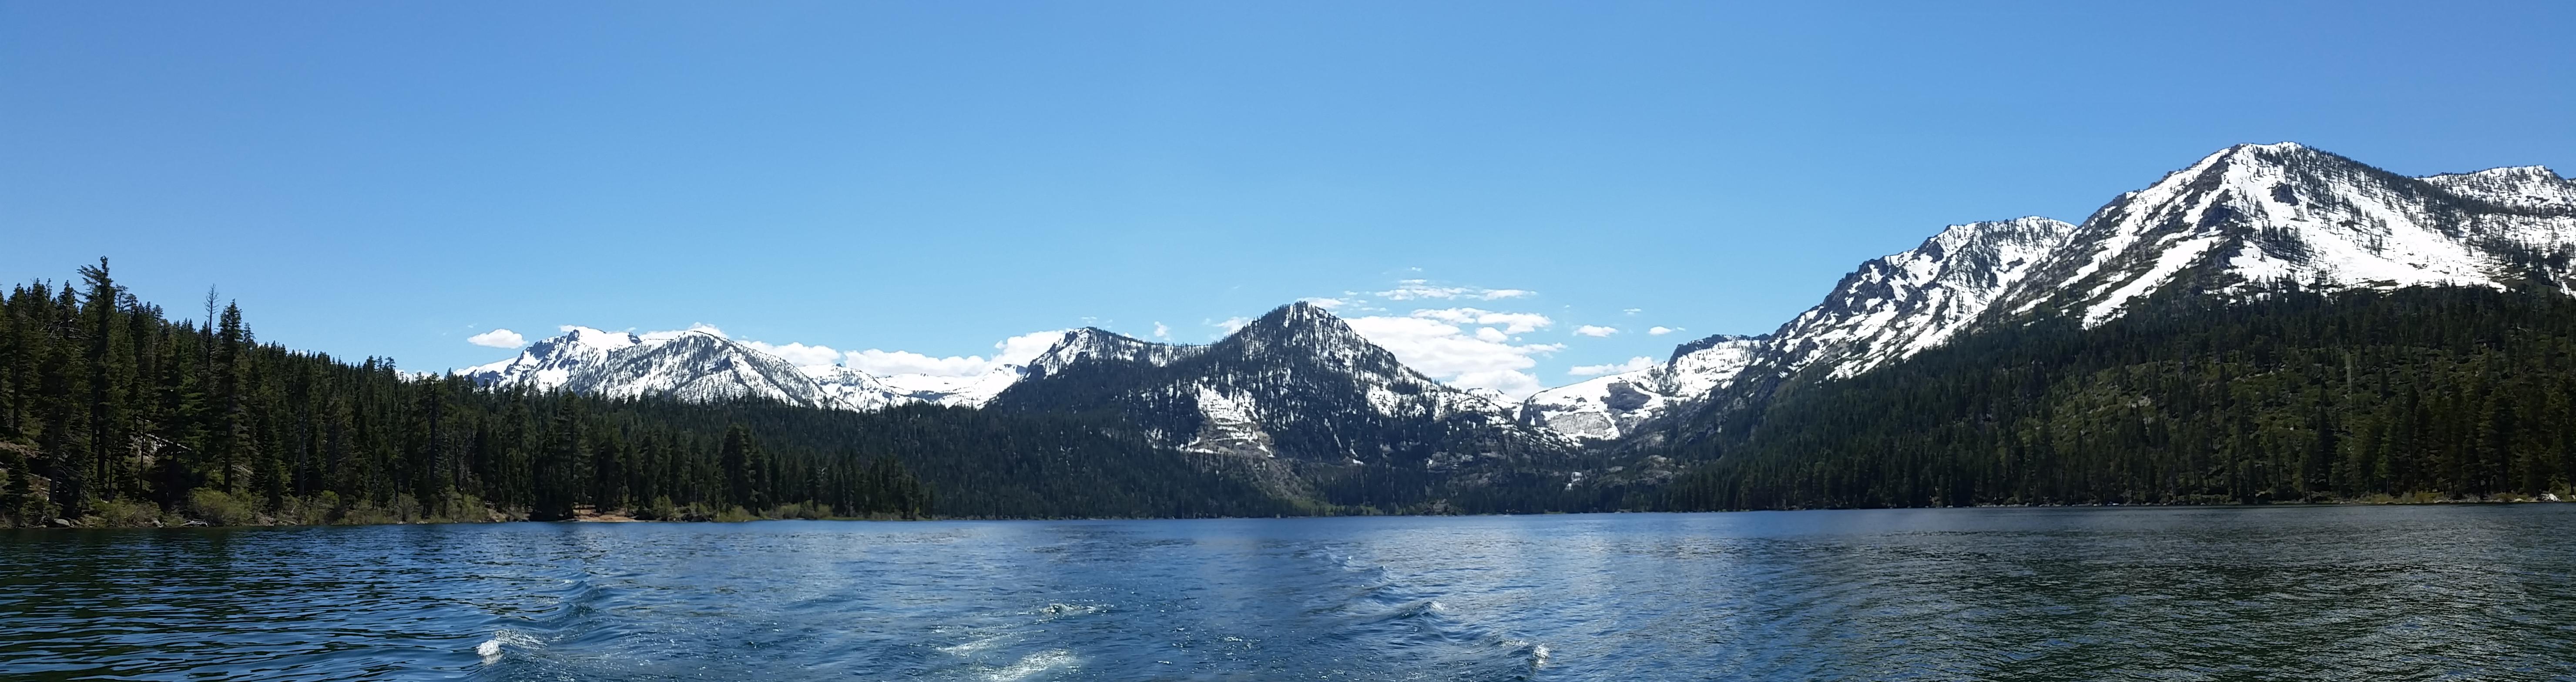 Emerald Bay PIcture